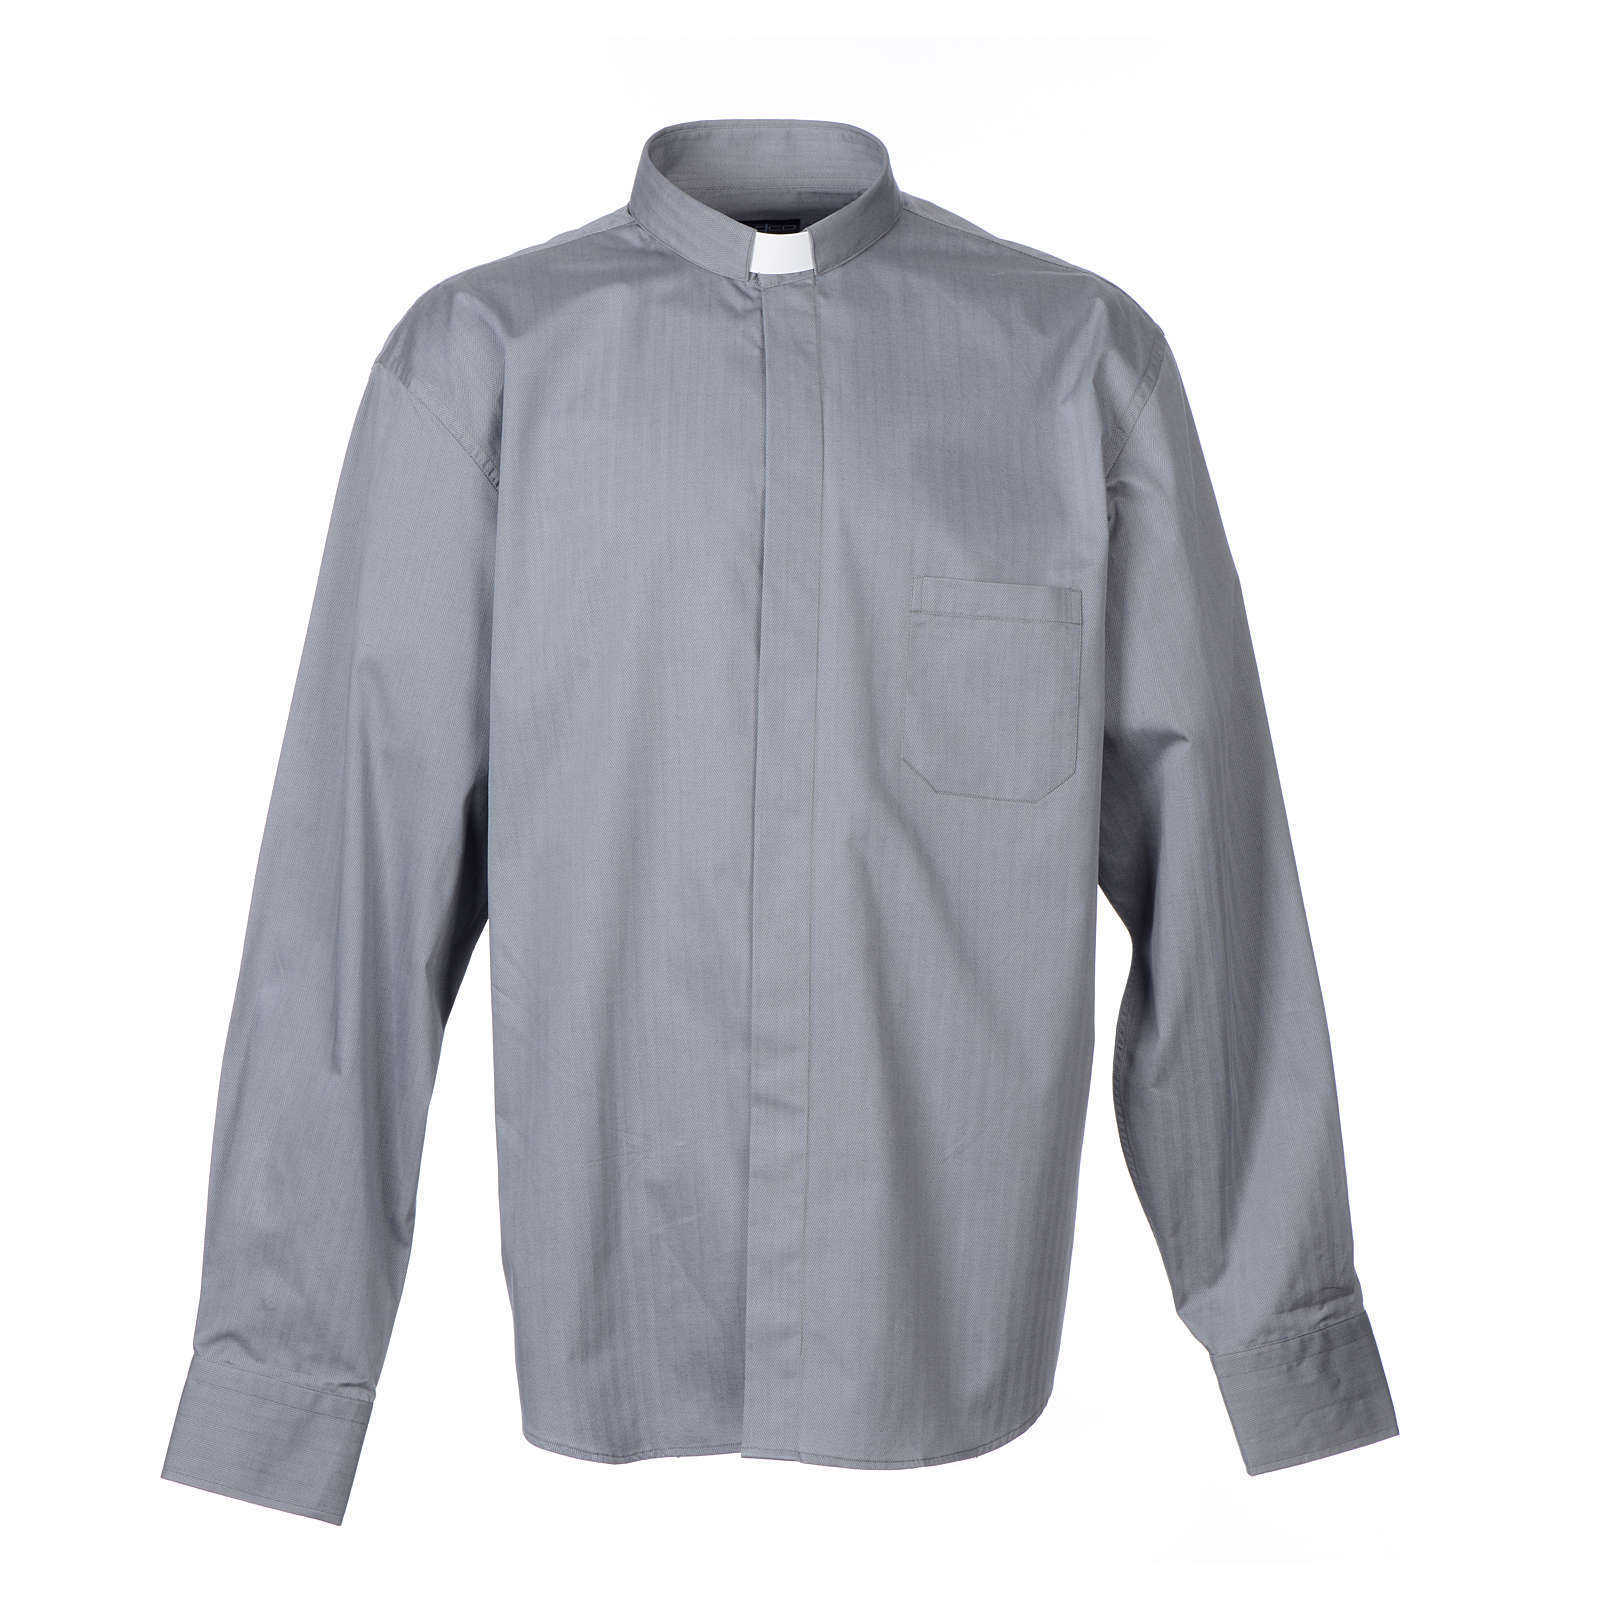 Camisa Clergy Manga Larga Planchado Facil, Mixto Algodón Espigado Gris 4